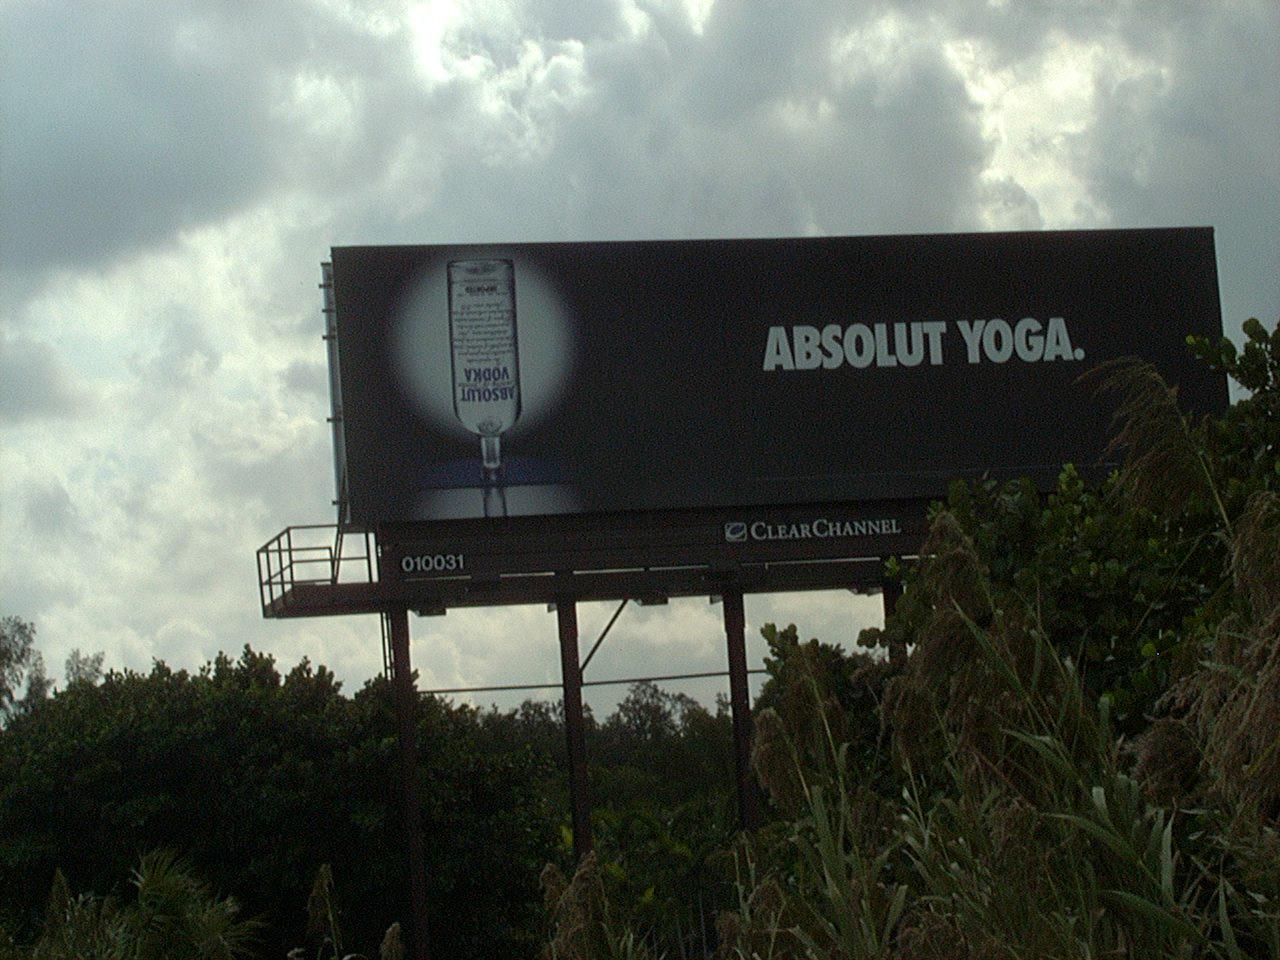 Absolute Yoga vodka pix